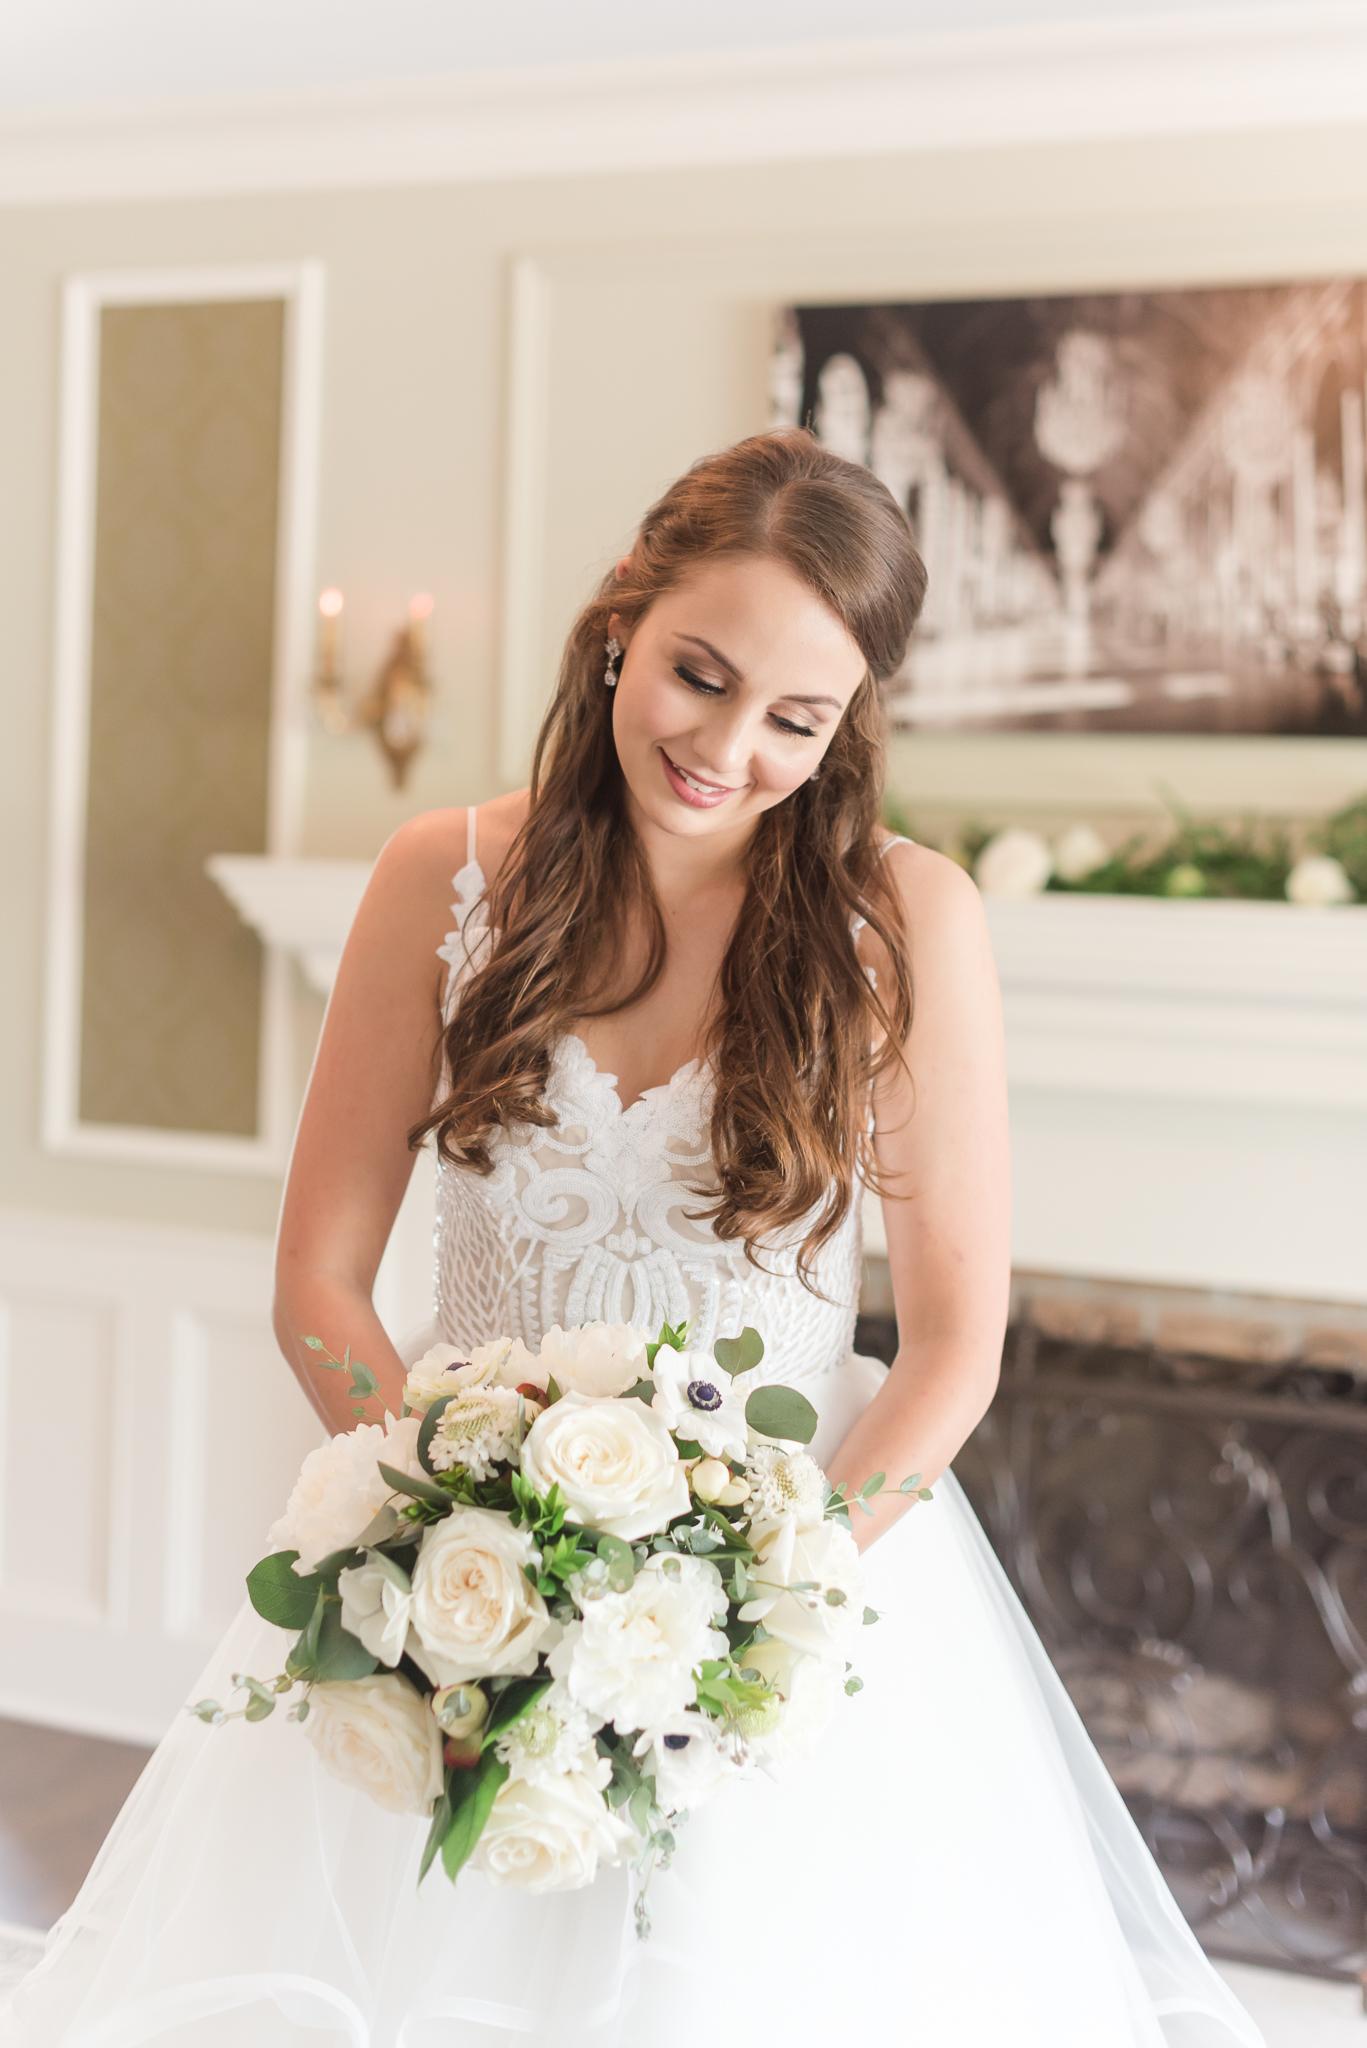 Black Iris Estate Wedding Elegant White with Greenery Luxury High End Flowers-6.jpg